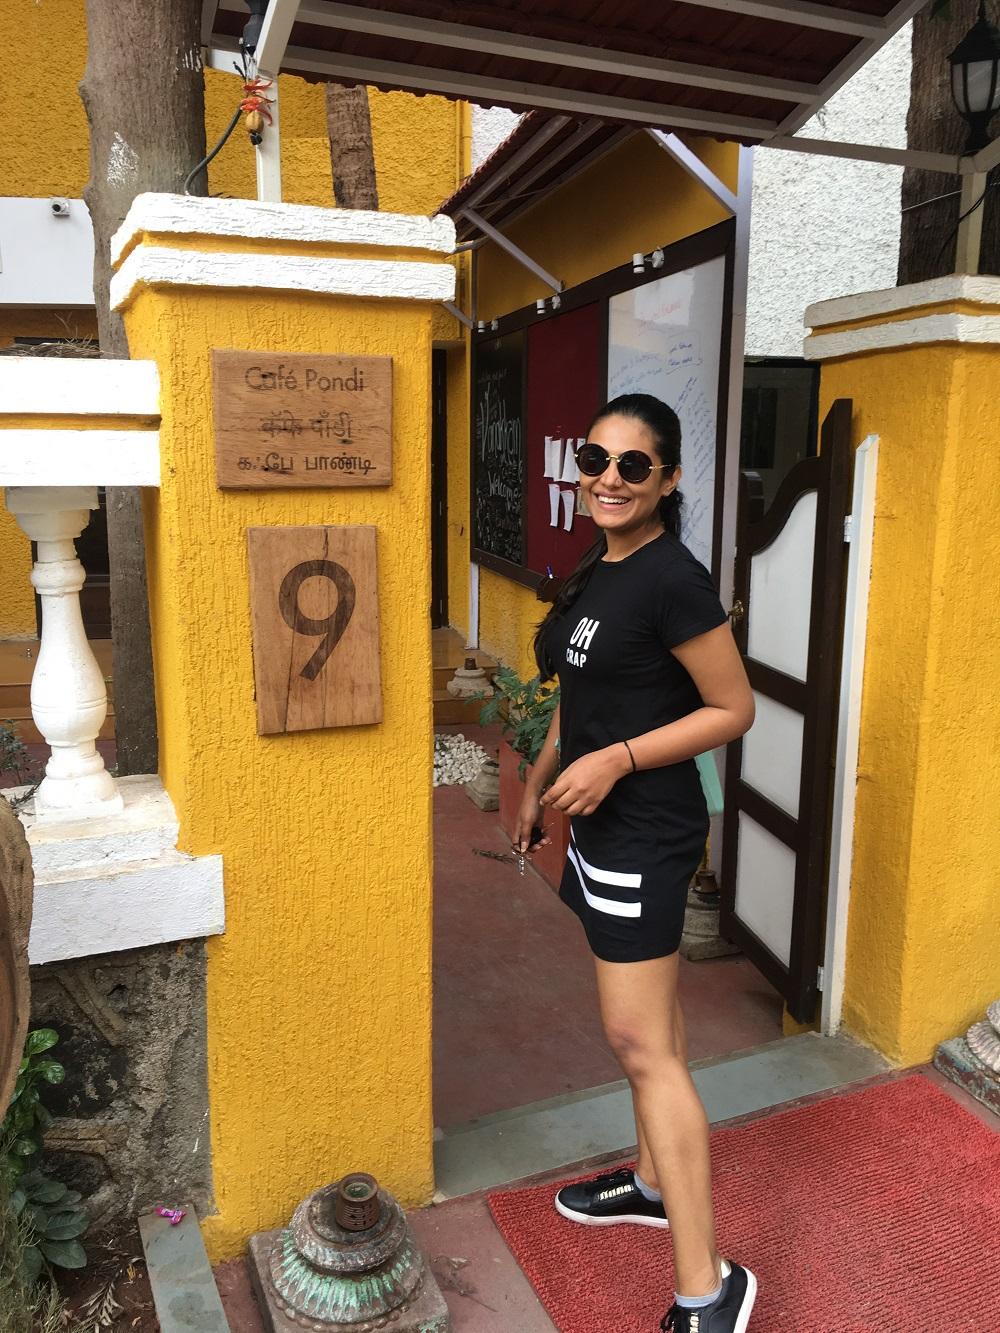 aayushi-yadav-winning-hearts-through-her-writings-ss-interview